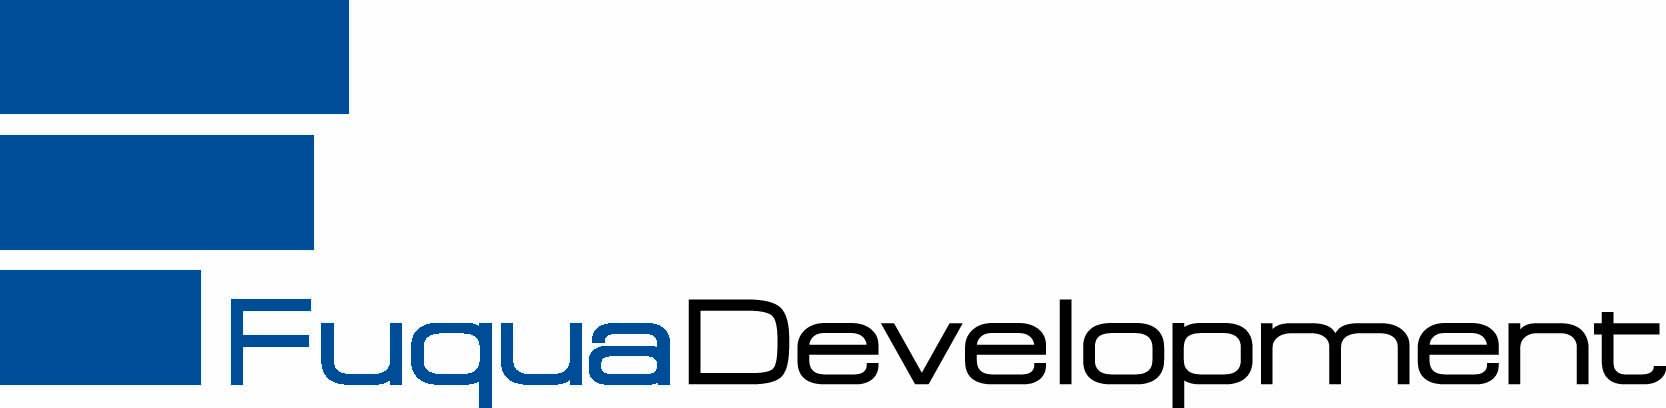 Property Managed by FUQUA Development